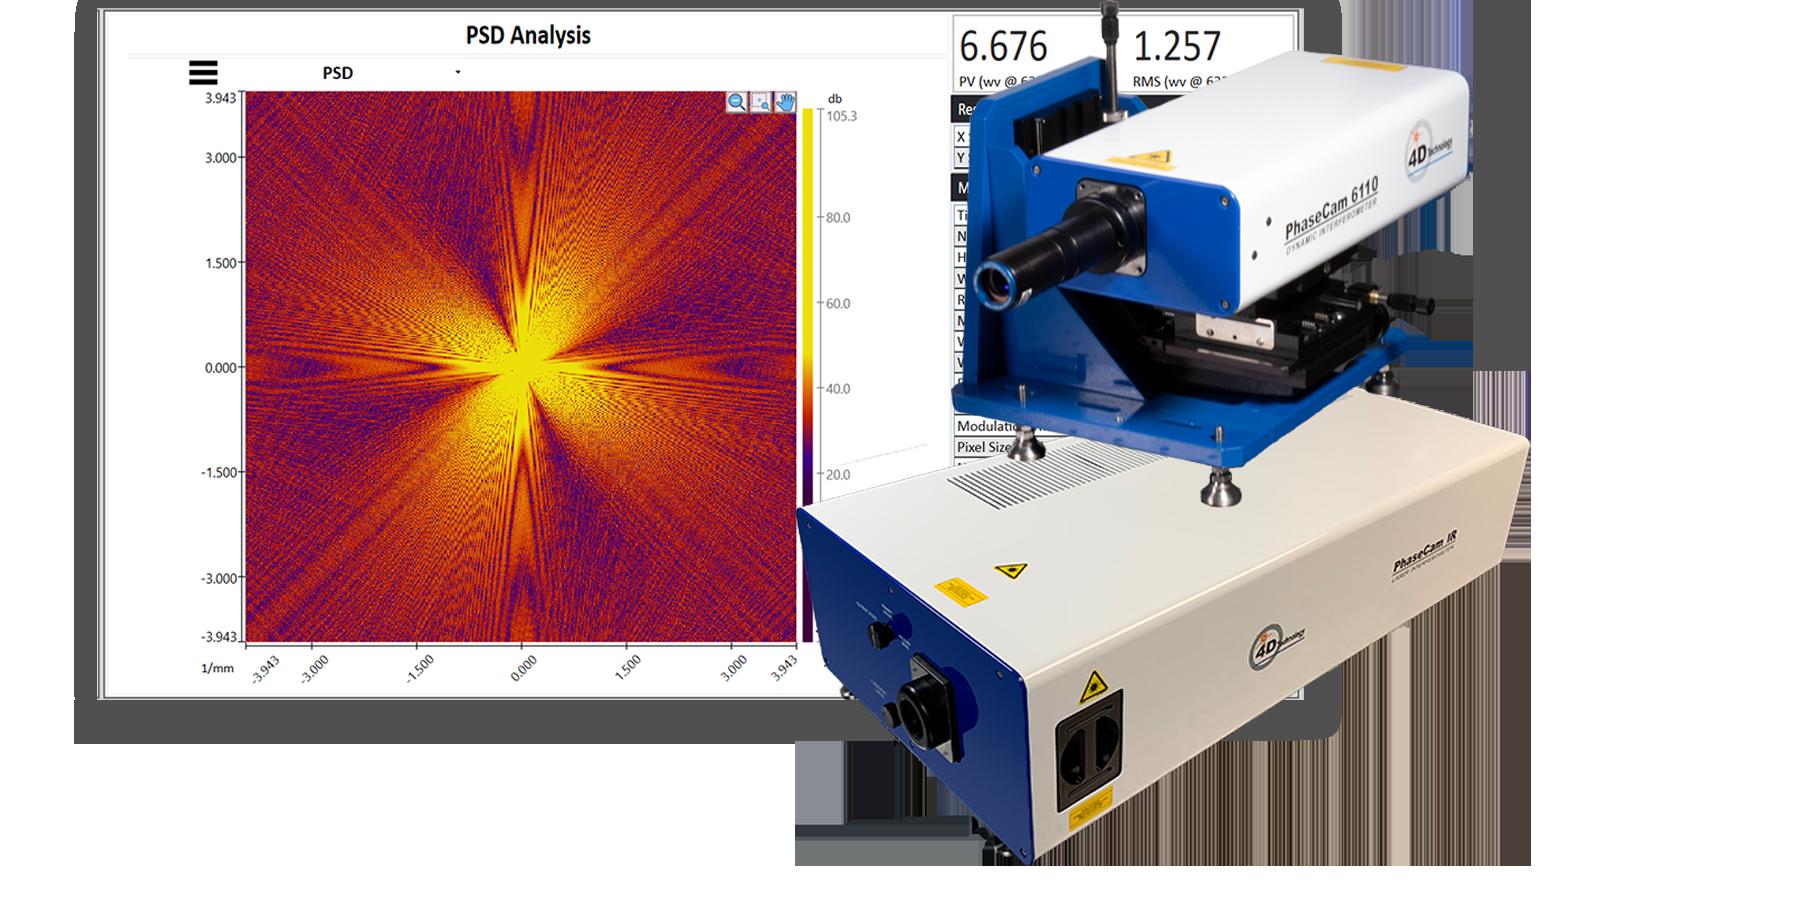 4D Technology PhaseCam NIR SWIR MWIR IR Infrared Twyman Green Laser Interferometer